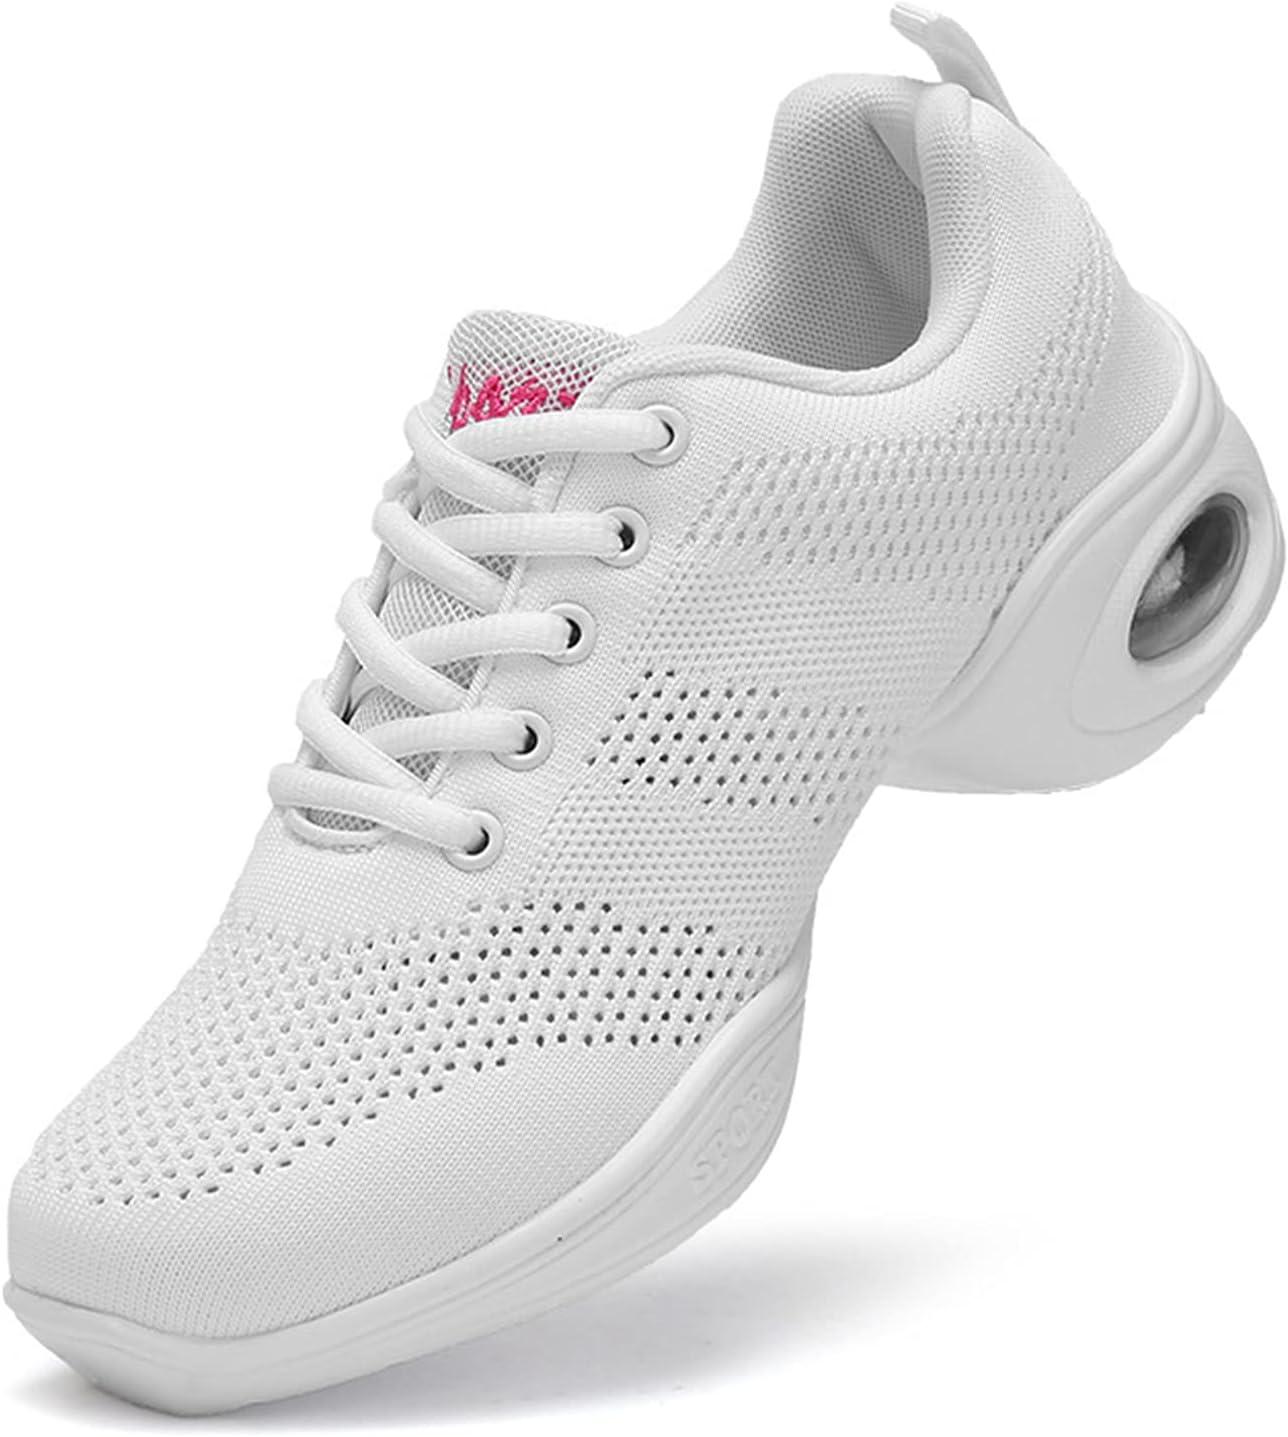 MYYU Women's Dance Shoes,Breathable Fashion Sneakers,Dance Jazz